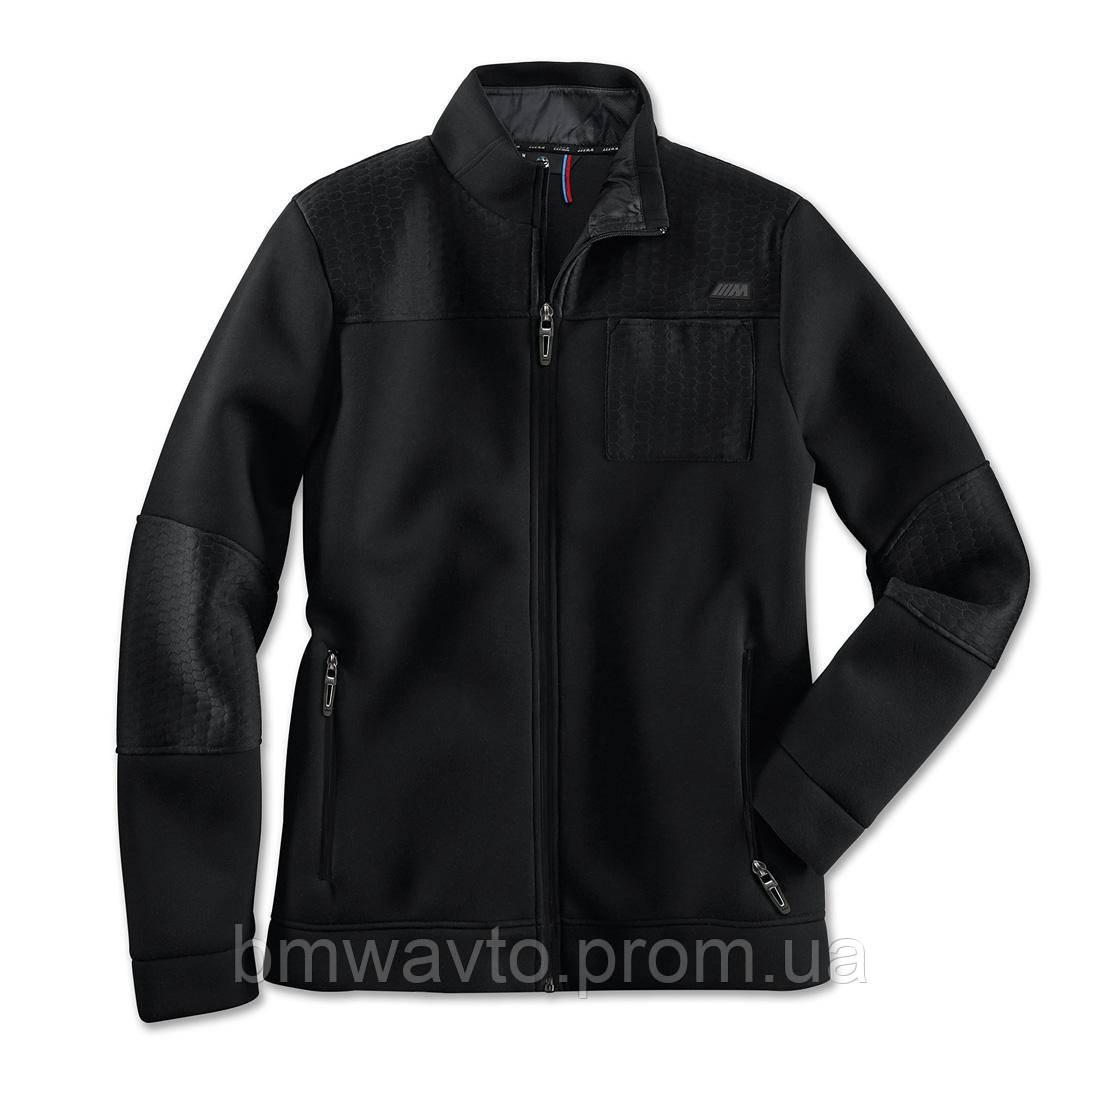 Мужская куртка BMW M Sweat Jacket, Men